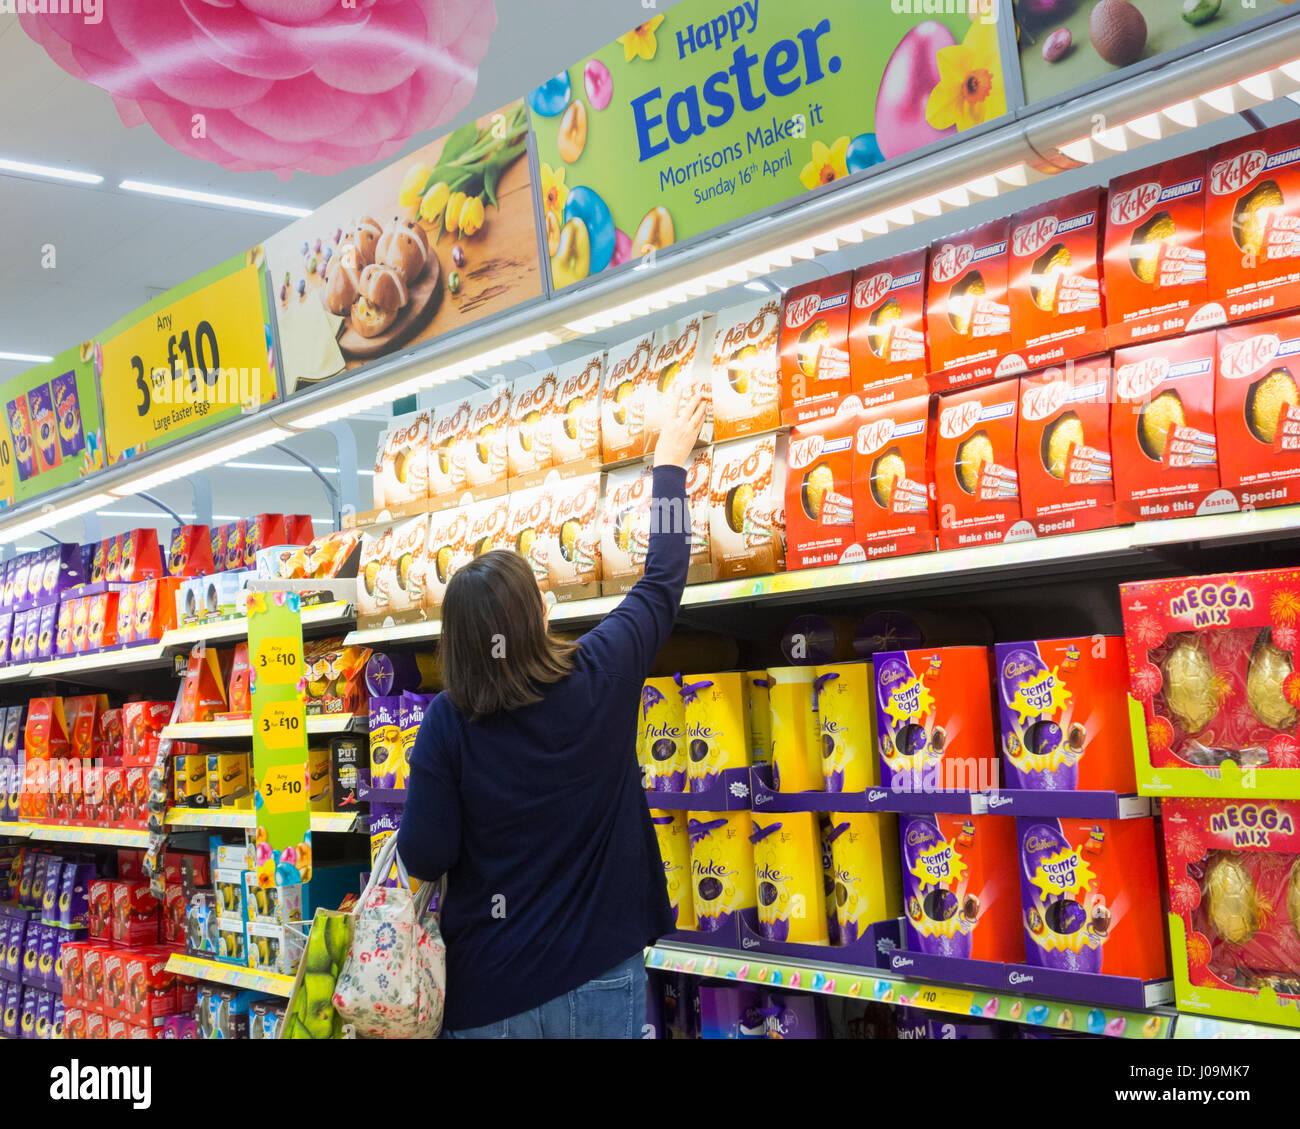 Morrisons supermarket aisle stock photos morrisons supermarket morrisons supermarket uk woman buying easter eggs stock image negle Gallery